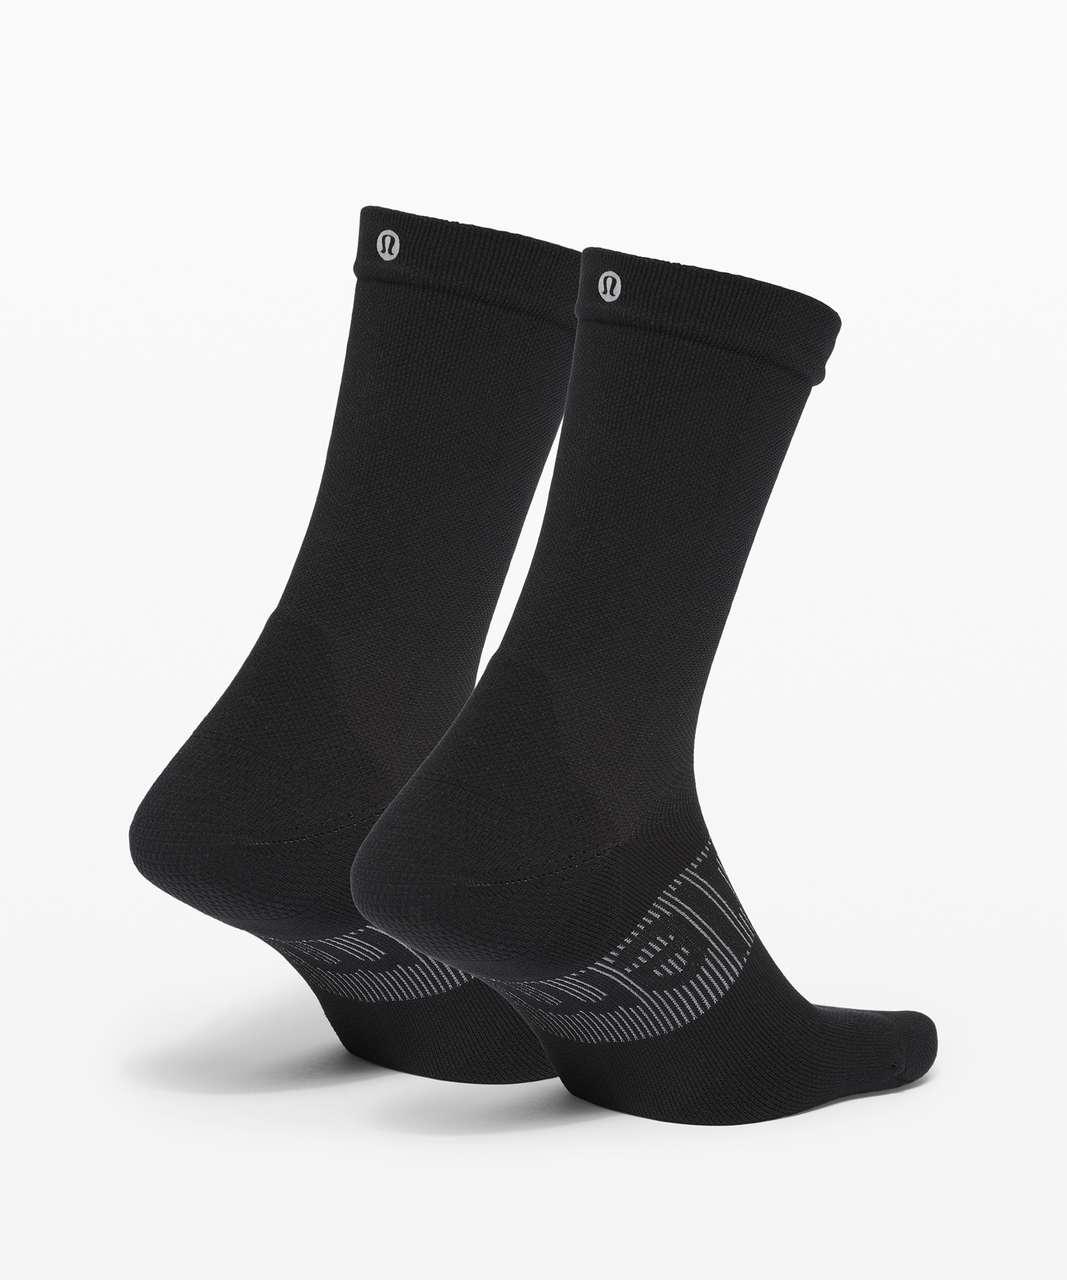 Lululemon Power Stride Crew Sock Wordmark *2 Pack - Black